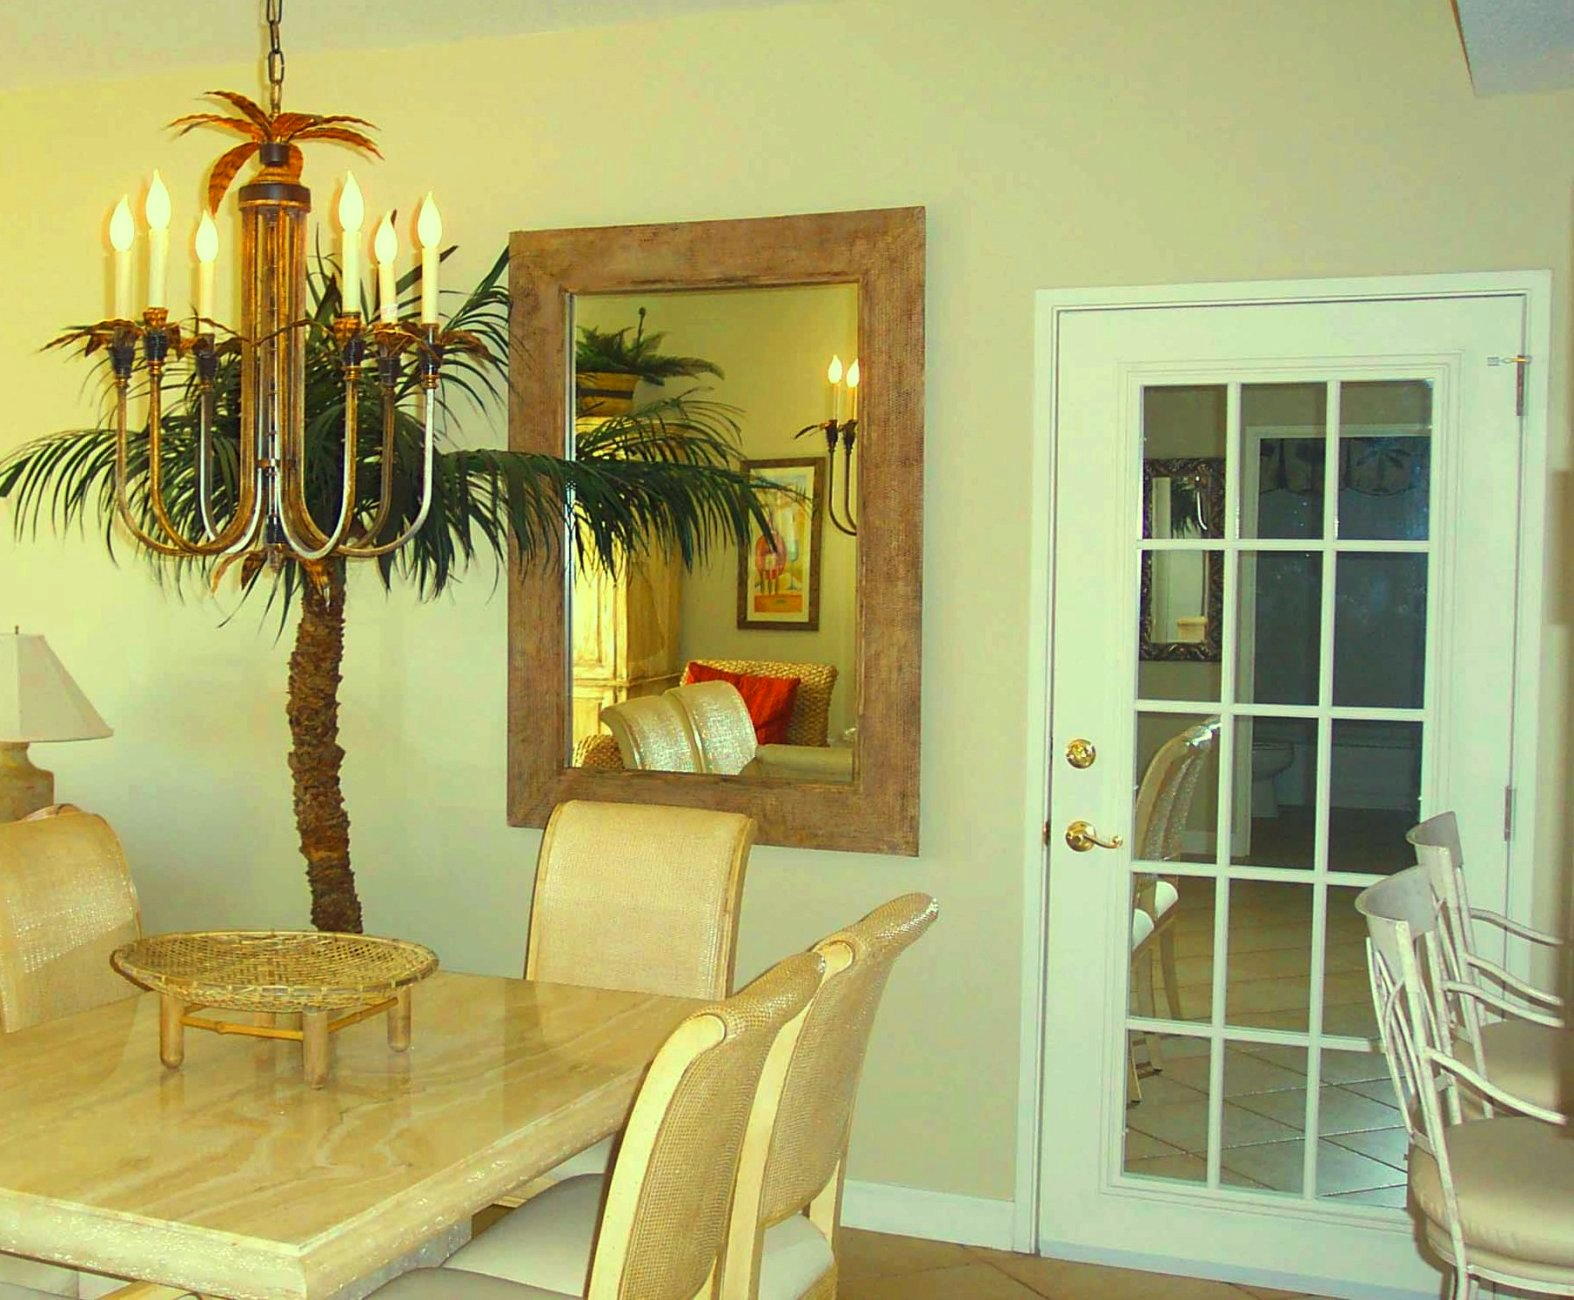 Interior design ideas gave this Greensboro, NC homeowner several ...